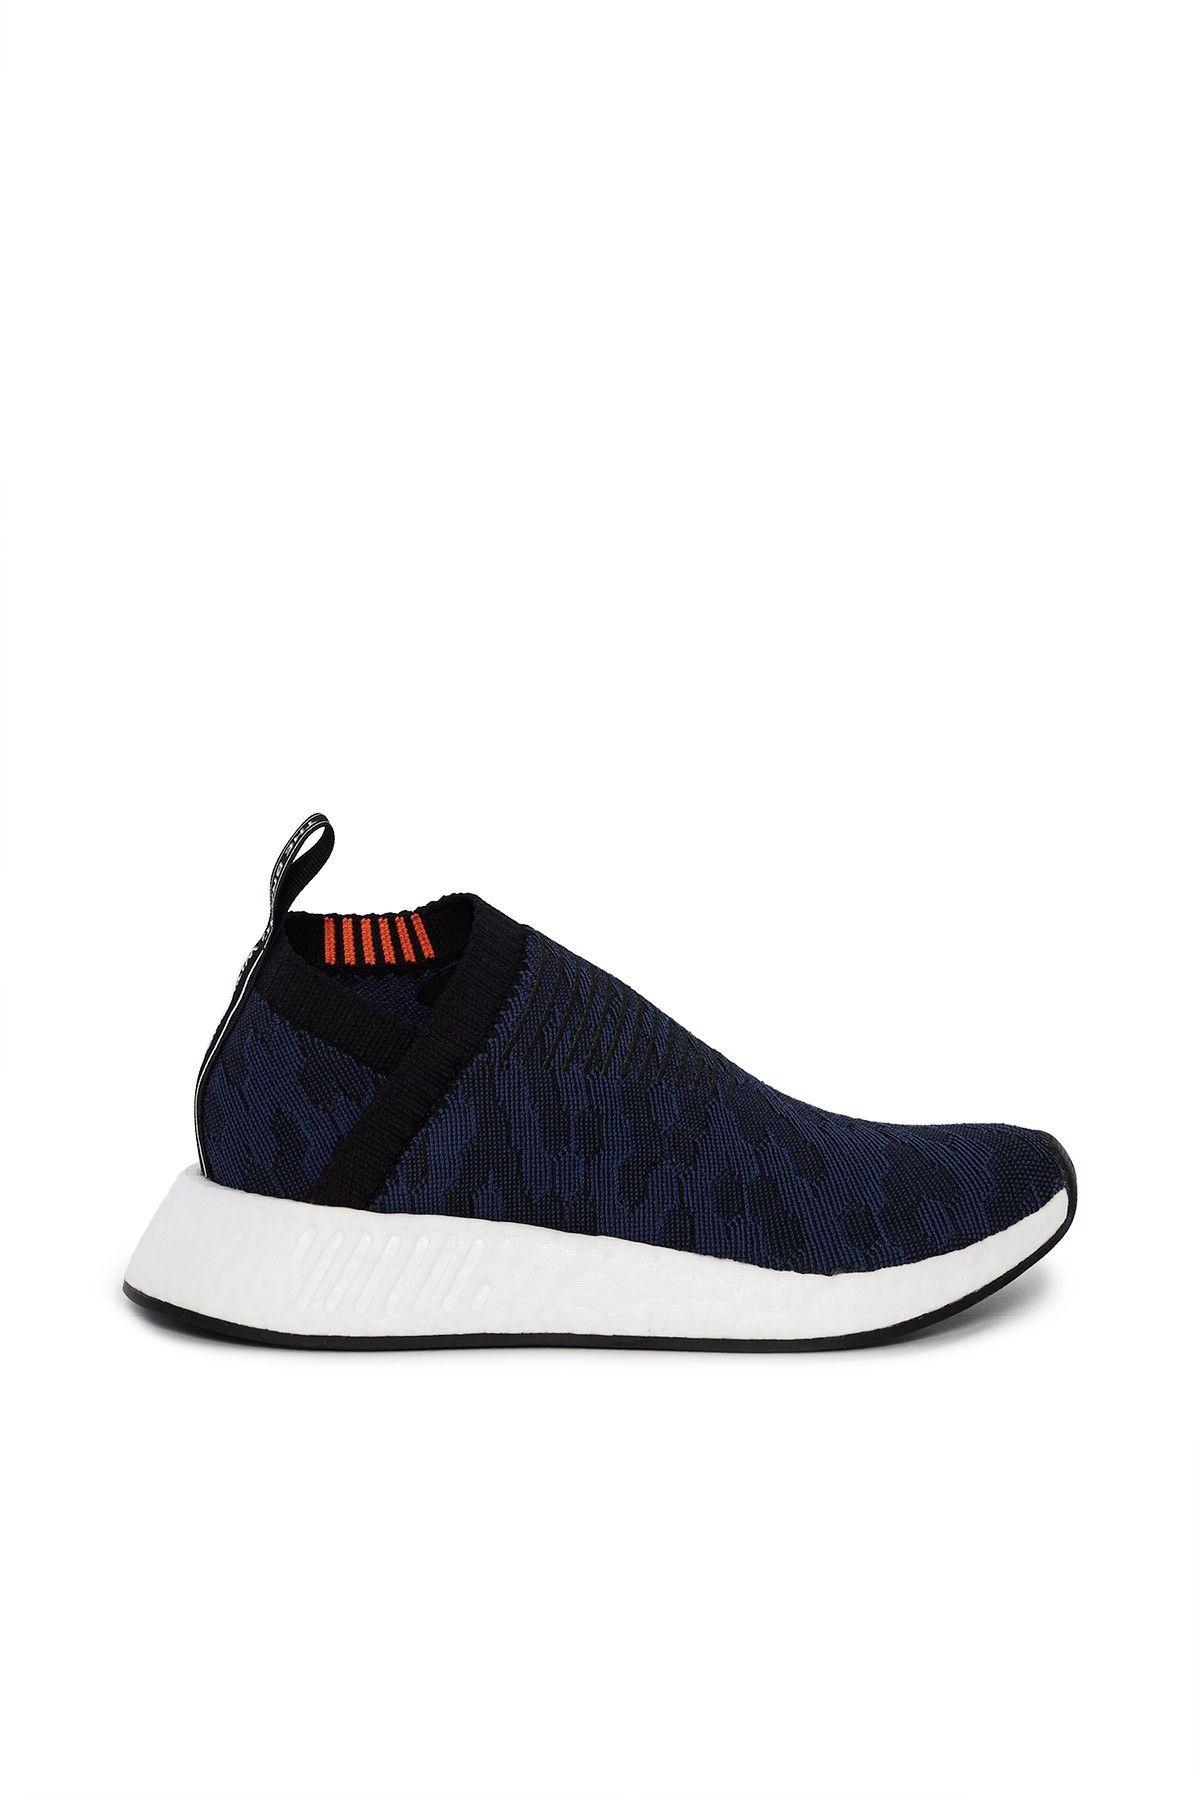 adidas Originals NMD_CS2 - Slip-ons - footwear white/grey two/core black HjAXn7TS